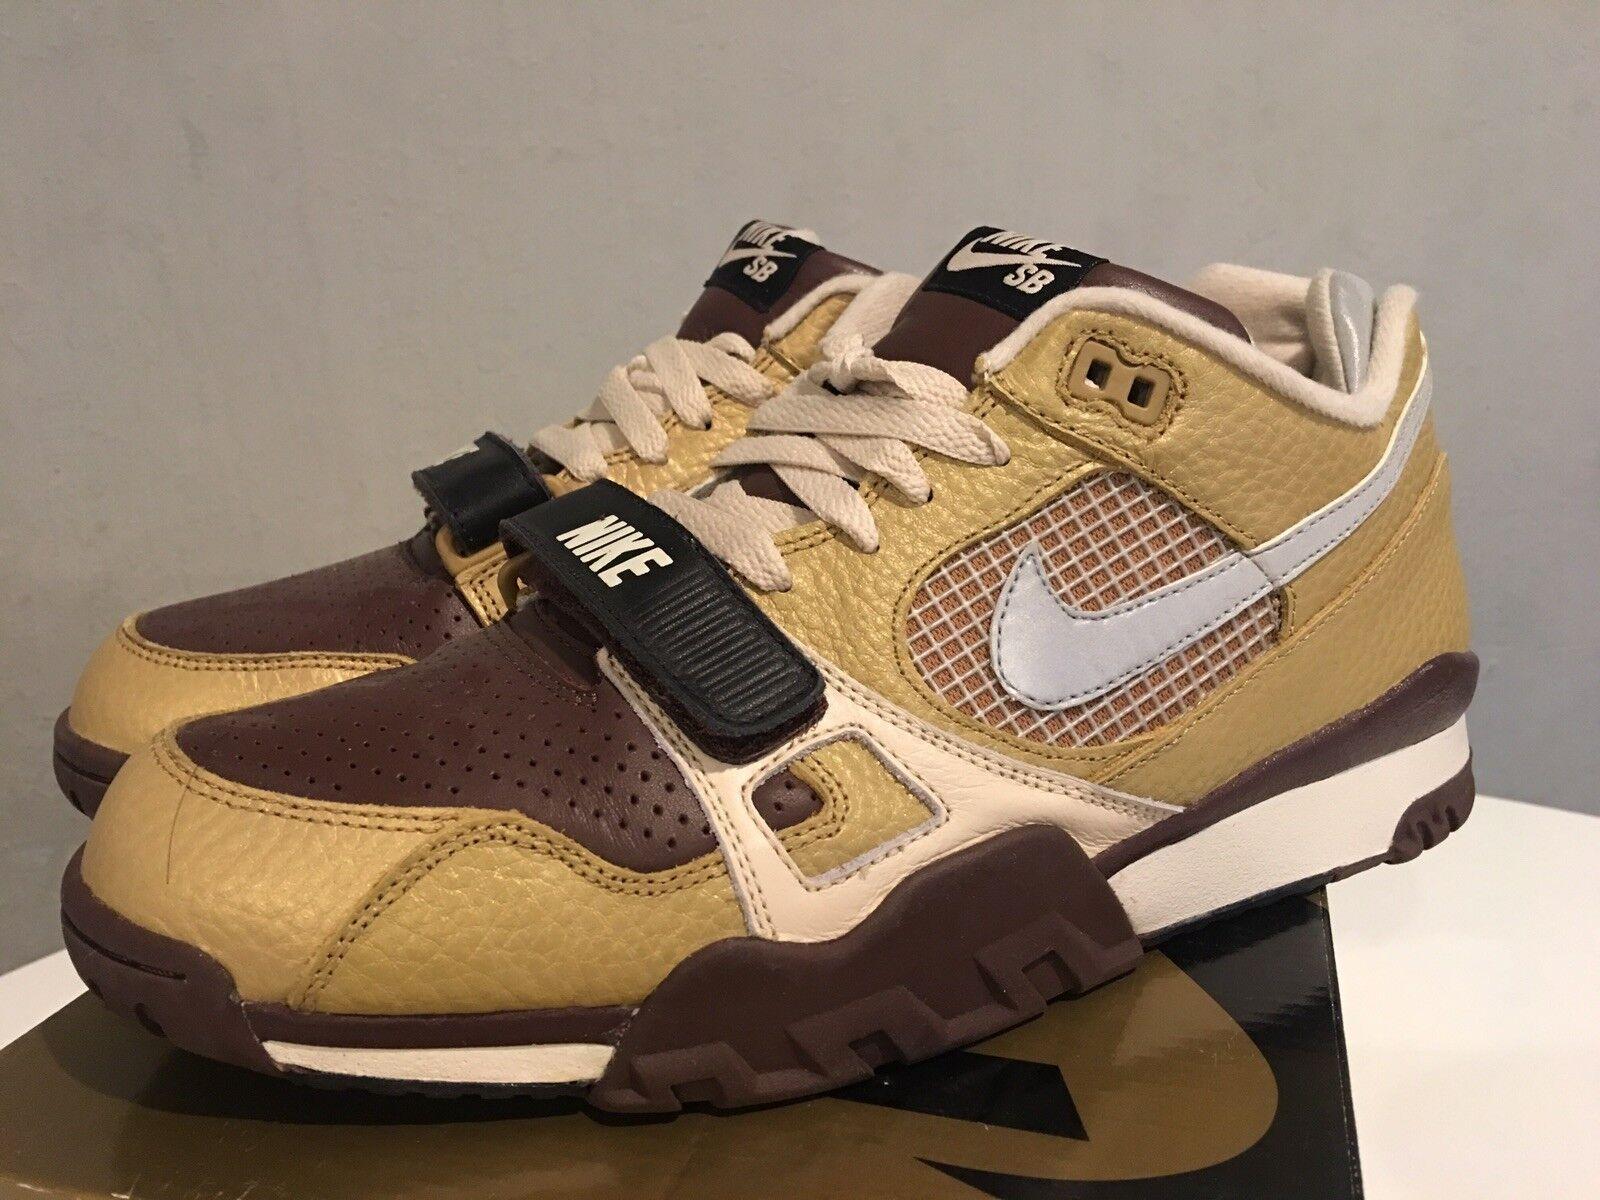 Men's Nike Air Trainer 2 SB metallic gold 328480-701 Sz11 SUPREME VNDS w BOX